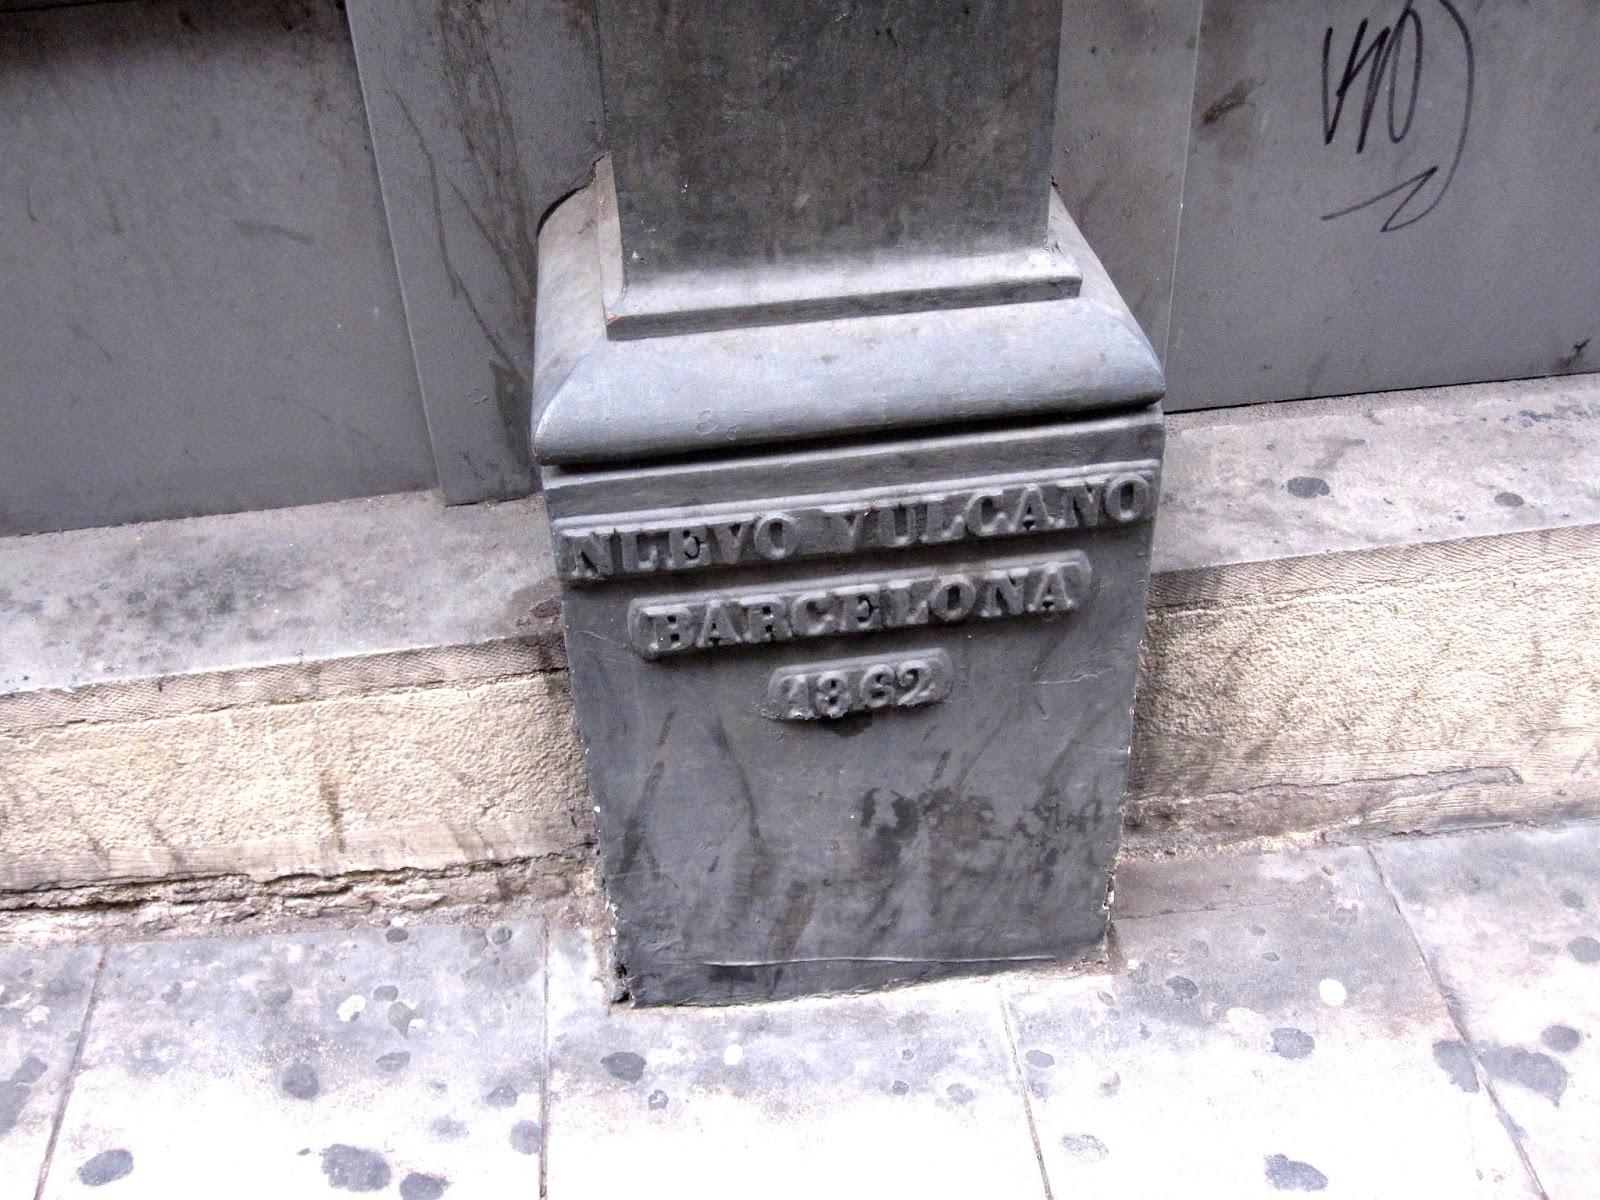 Tot barcelona temps era temps nuevo vulcano - Calle princesa barcelona ...